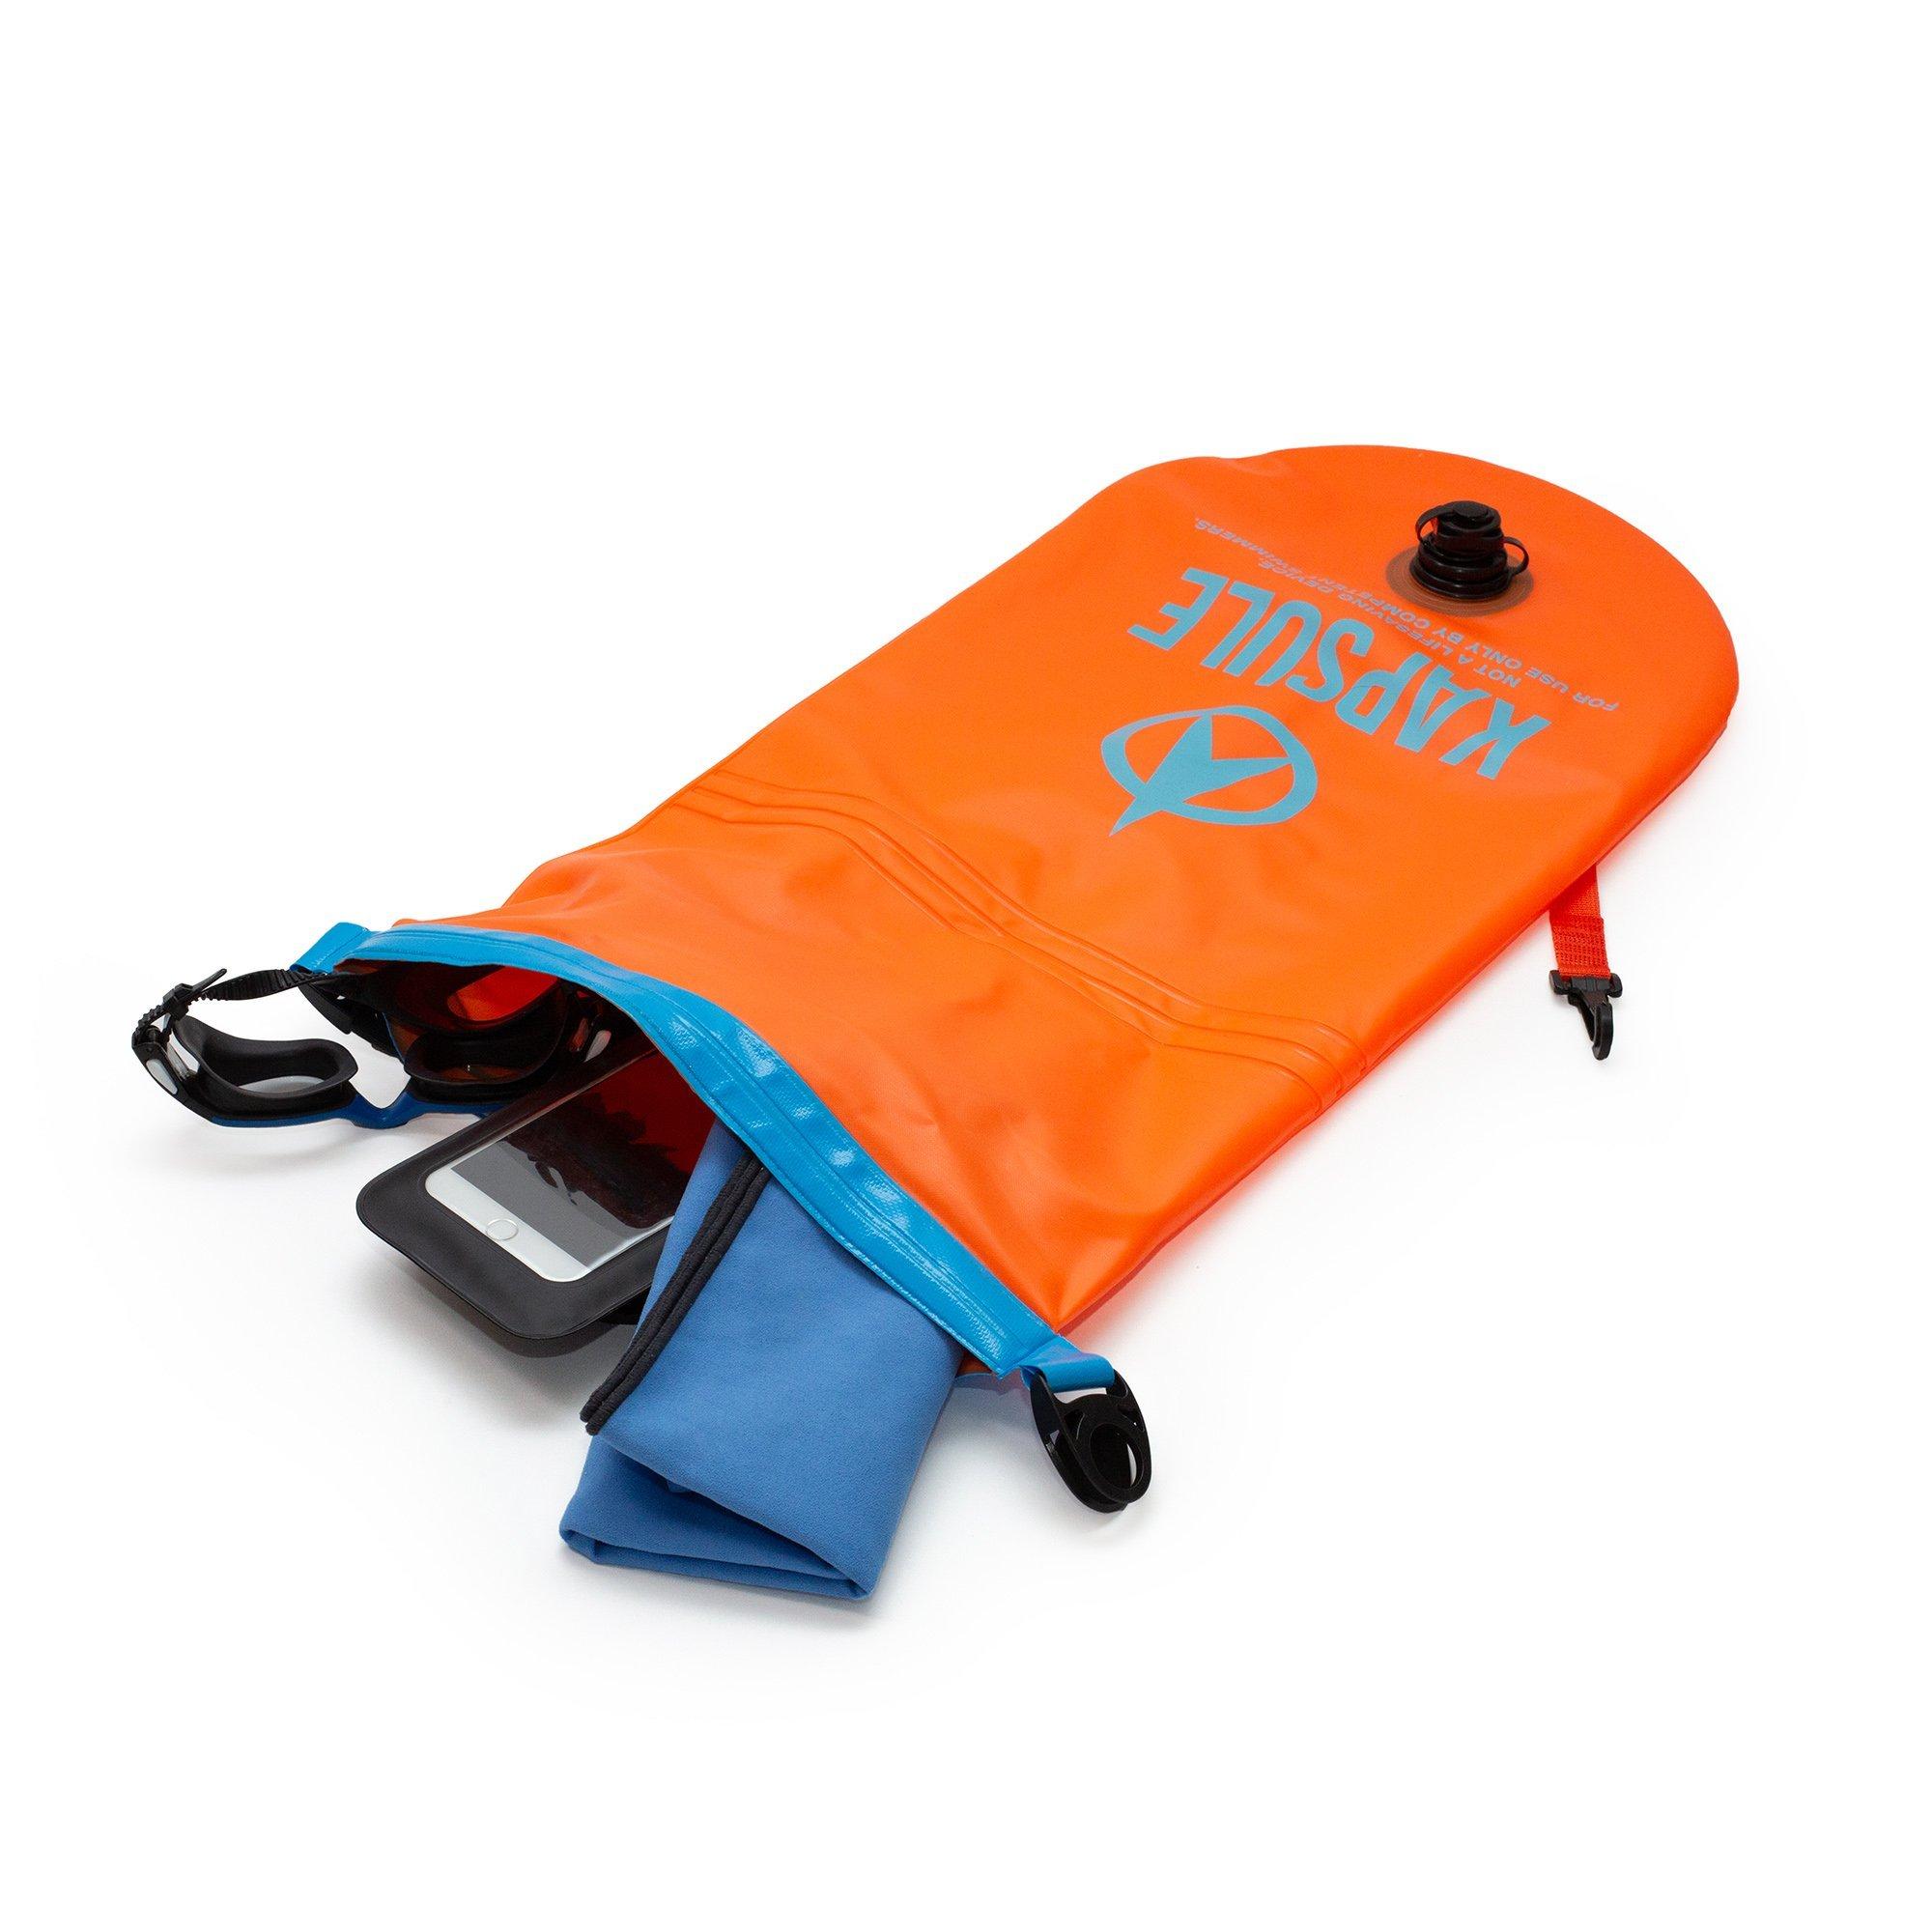 KAPSULE Swim Buoy (NEON 20L Orange) - Personal Swimming Float and Dry Bag by KAPSULE (Image #6)